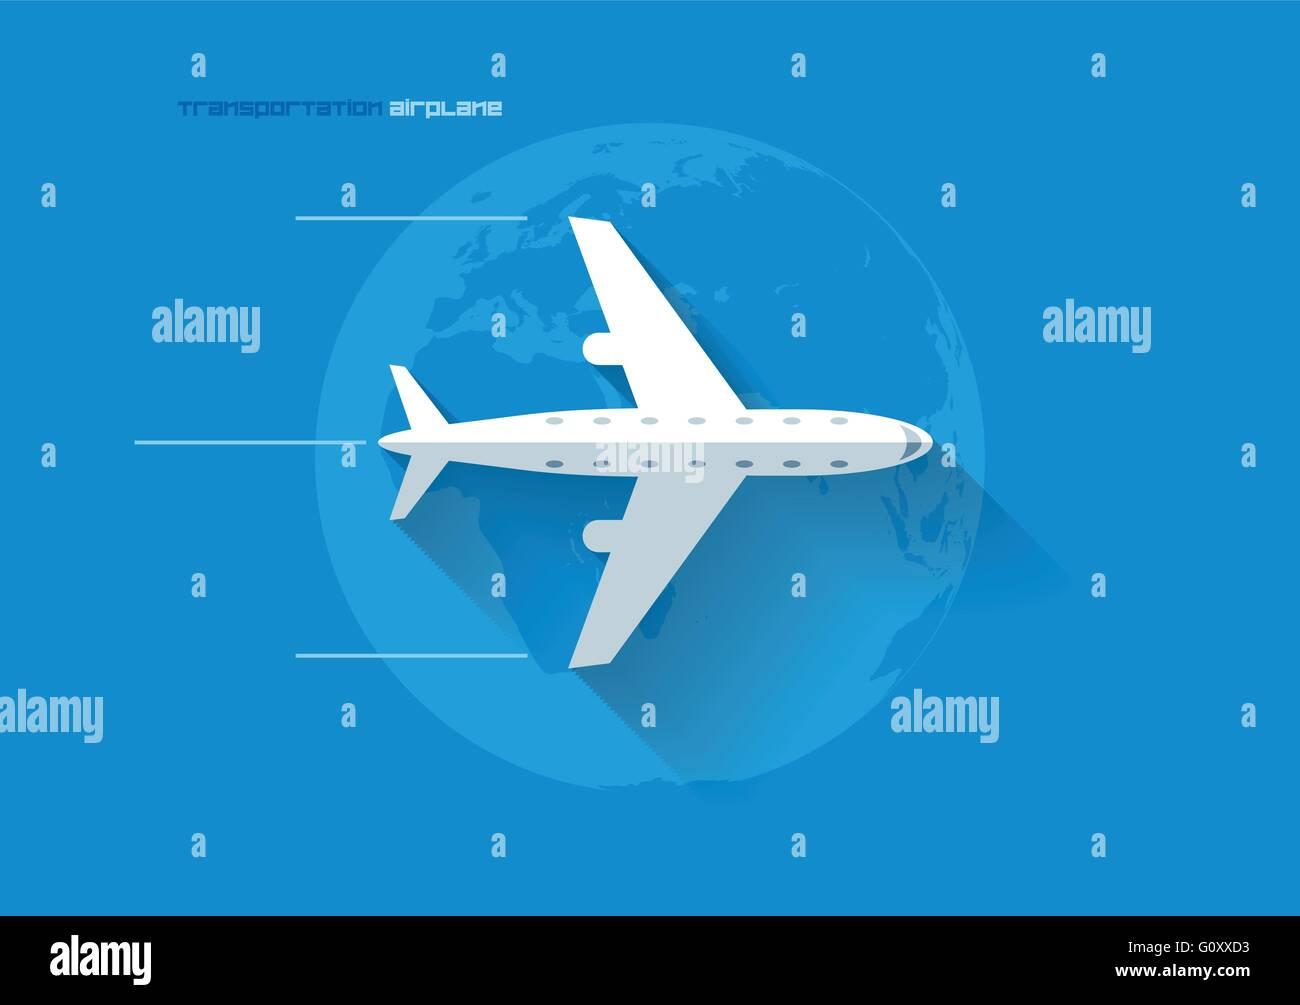 Vector flat transportation concept icon illustration. Airplane. - Stock Image